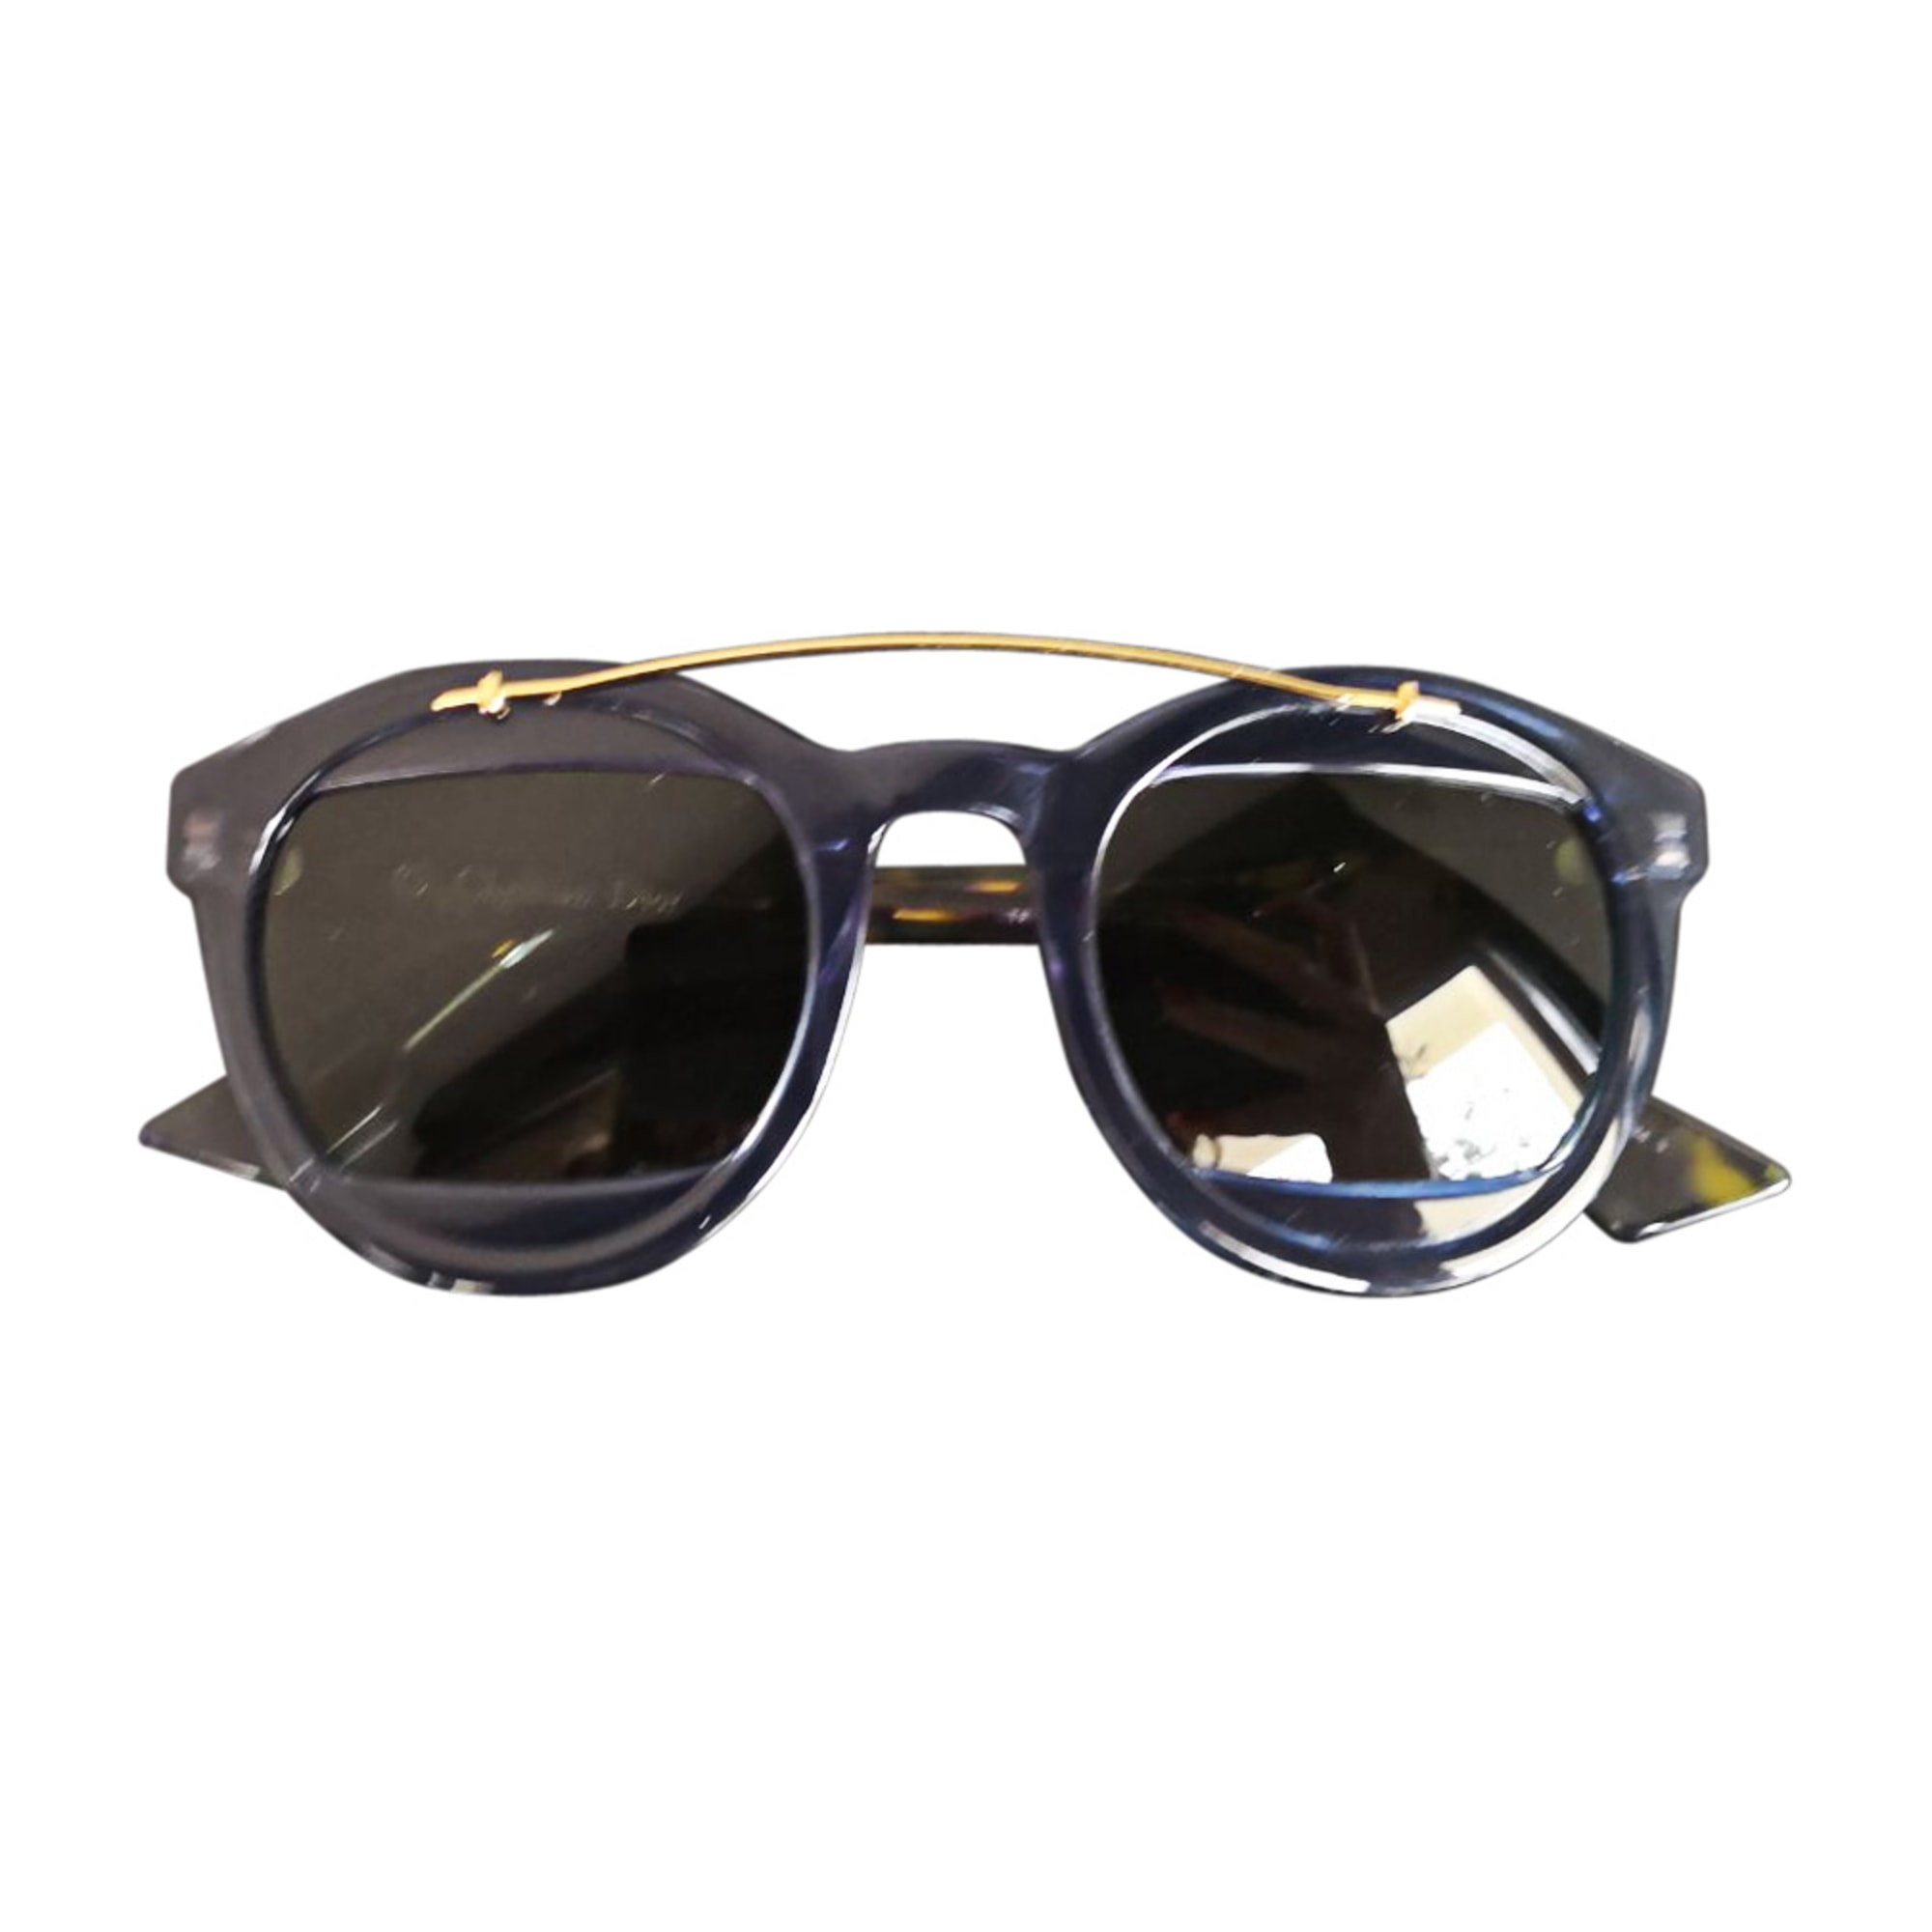 Sonnenbrille DIOR Blau, marineblau, türkisblau